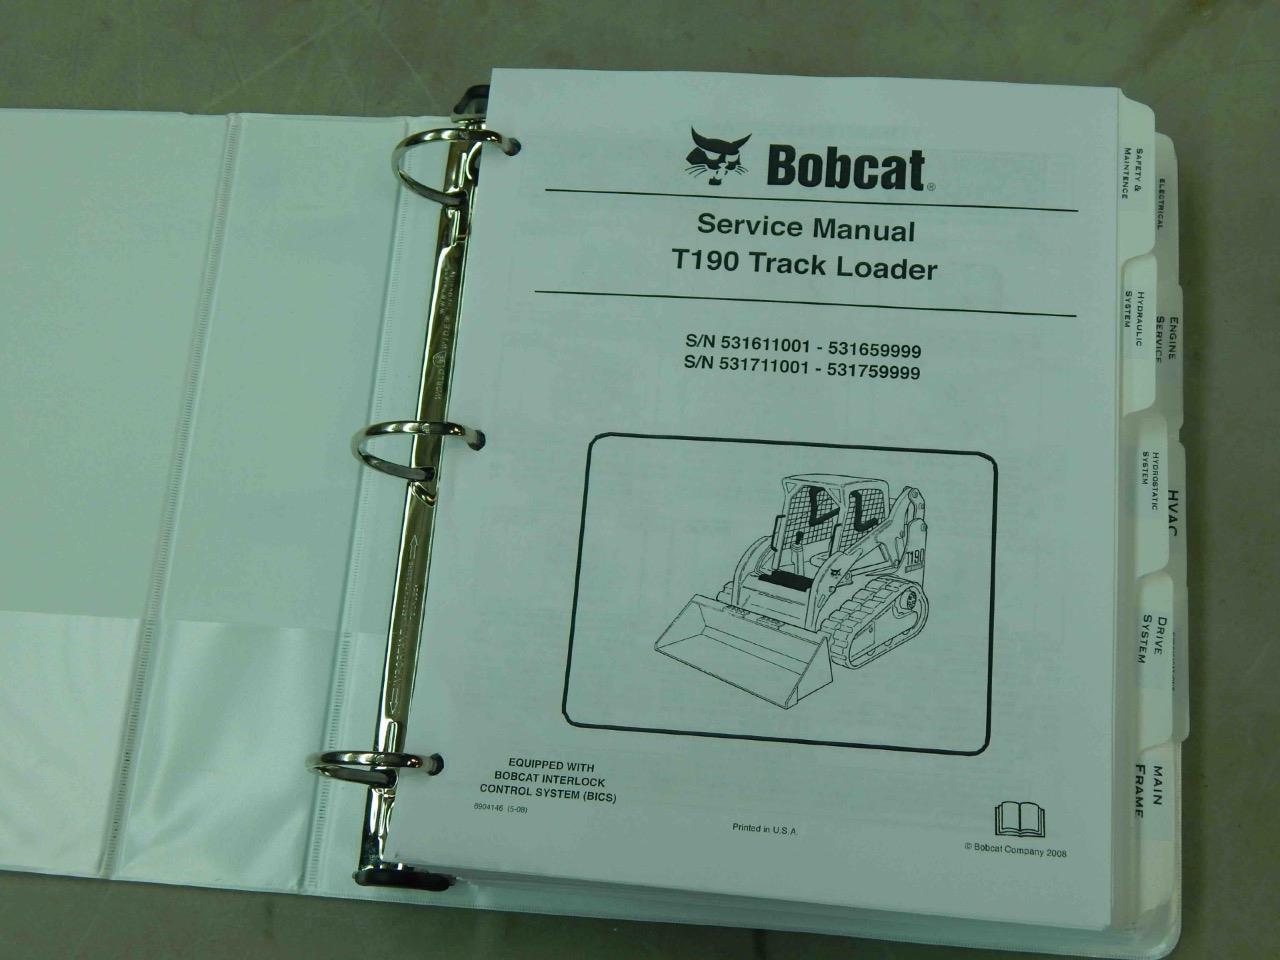 Bobcat T Wiring Schematic on s300 bobcat wiring schematic, t190 bobcat manual, t650 bobcat wiring schematic, s185 bobcat wiring schematic,